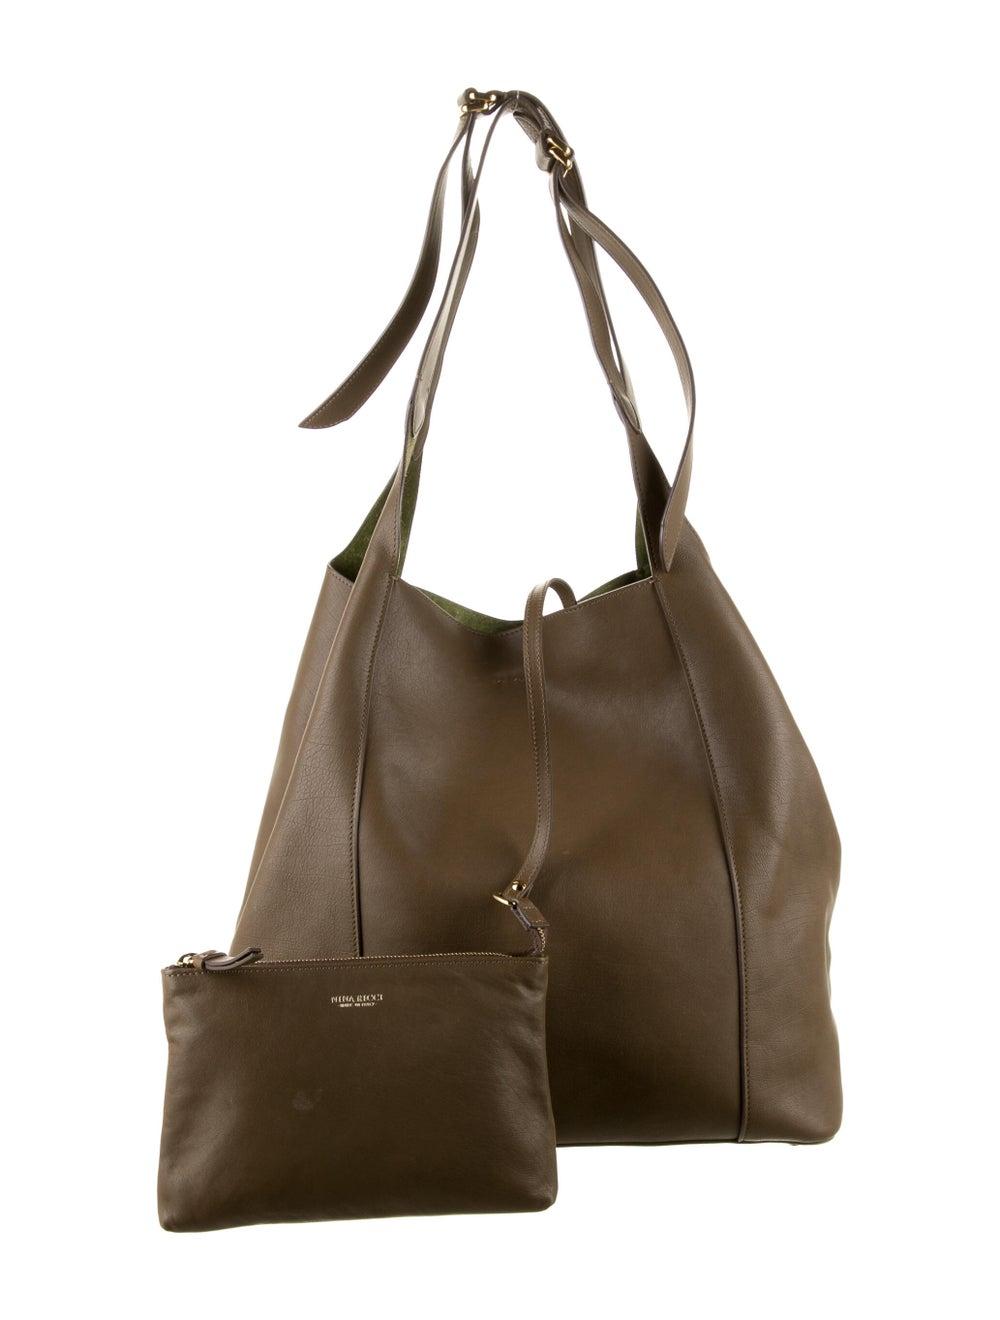 Nina Ricci Leather Tote Bag Brown - image 4